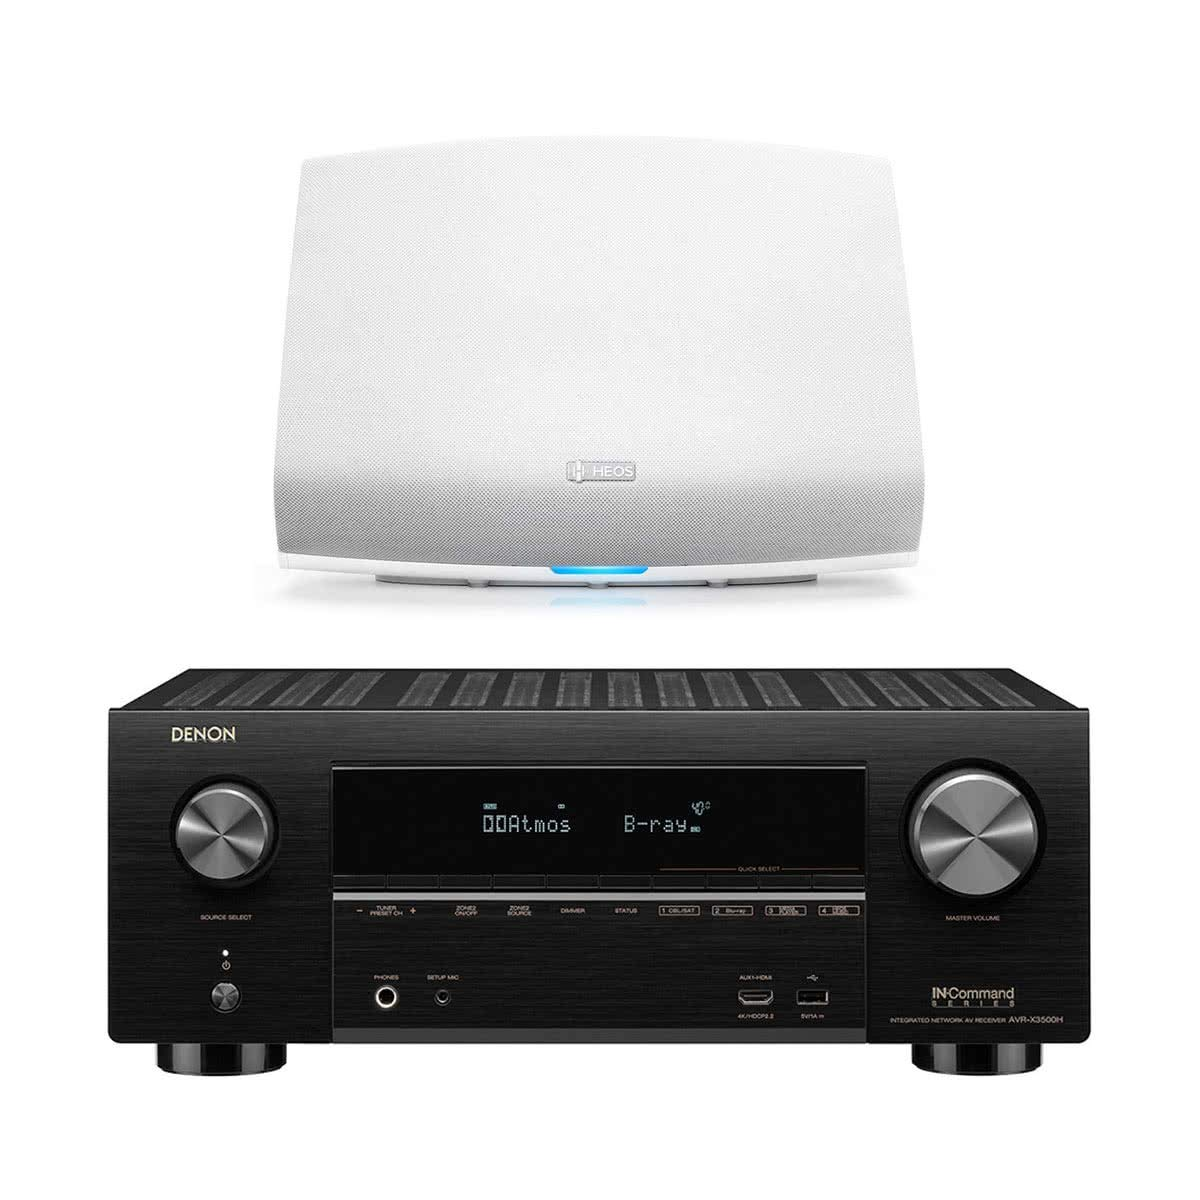 Series 2 Denon HEOS 7 Wireless Streaming Speaker